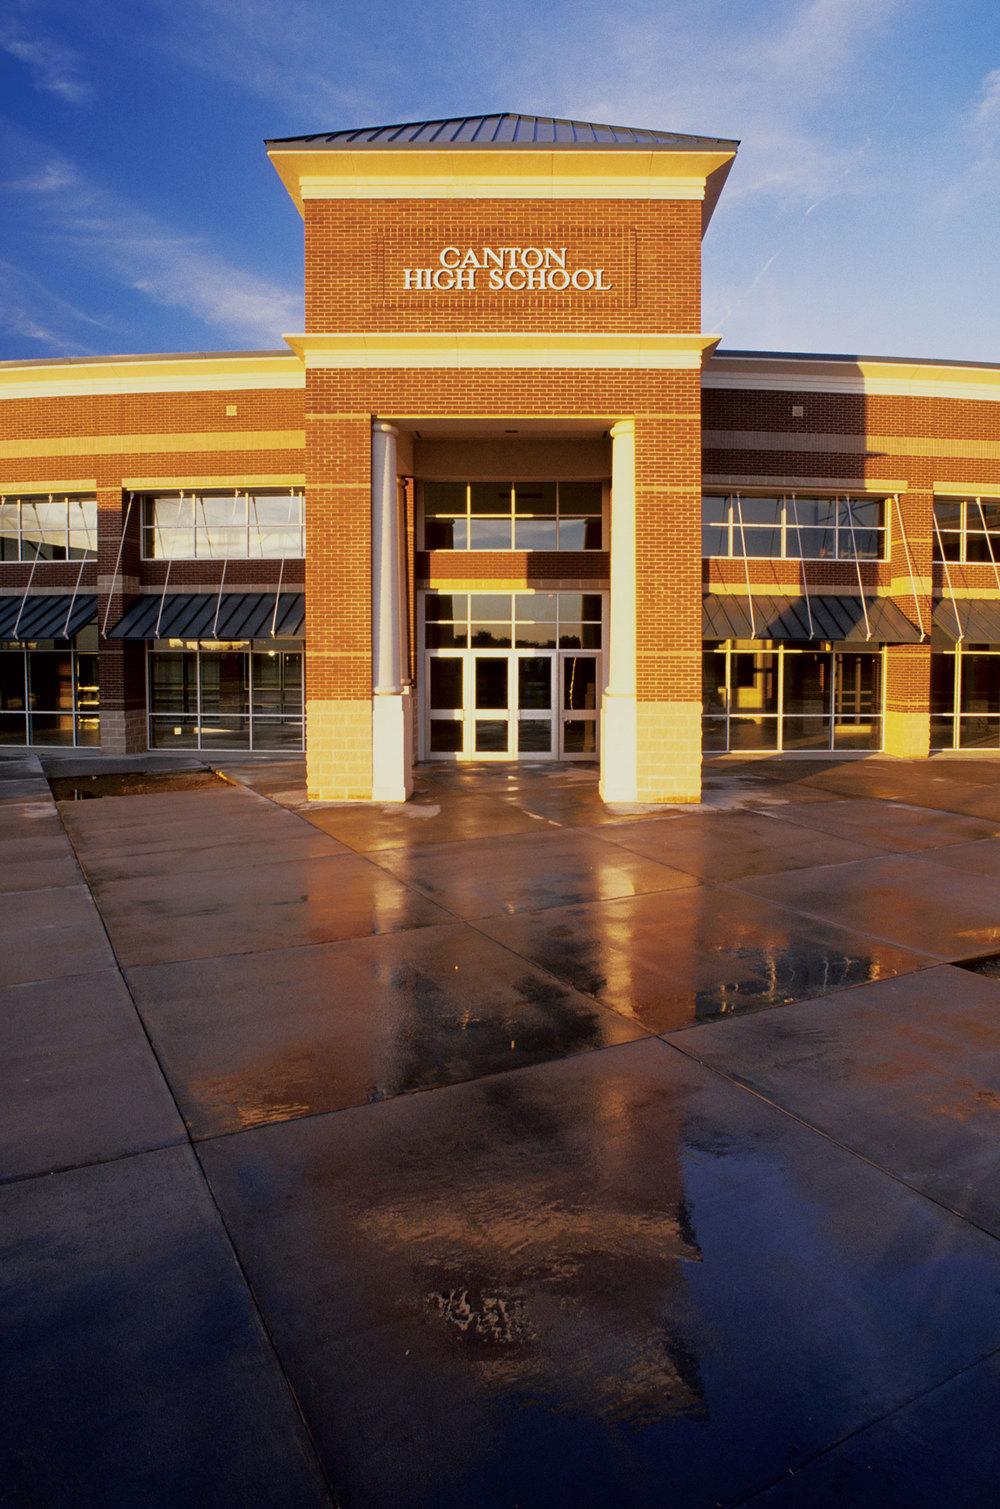 canton high school jbhm architecture